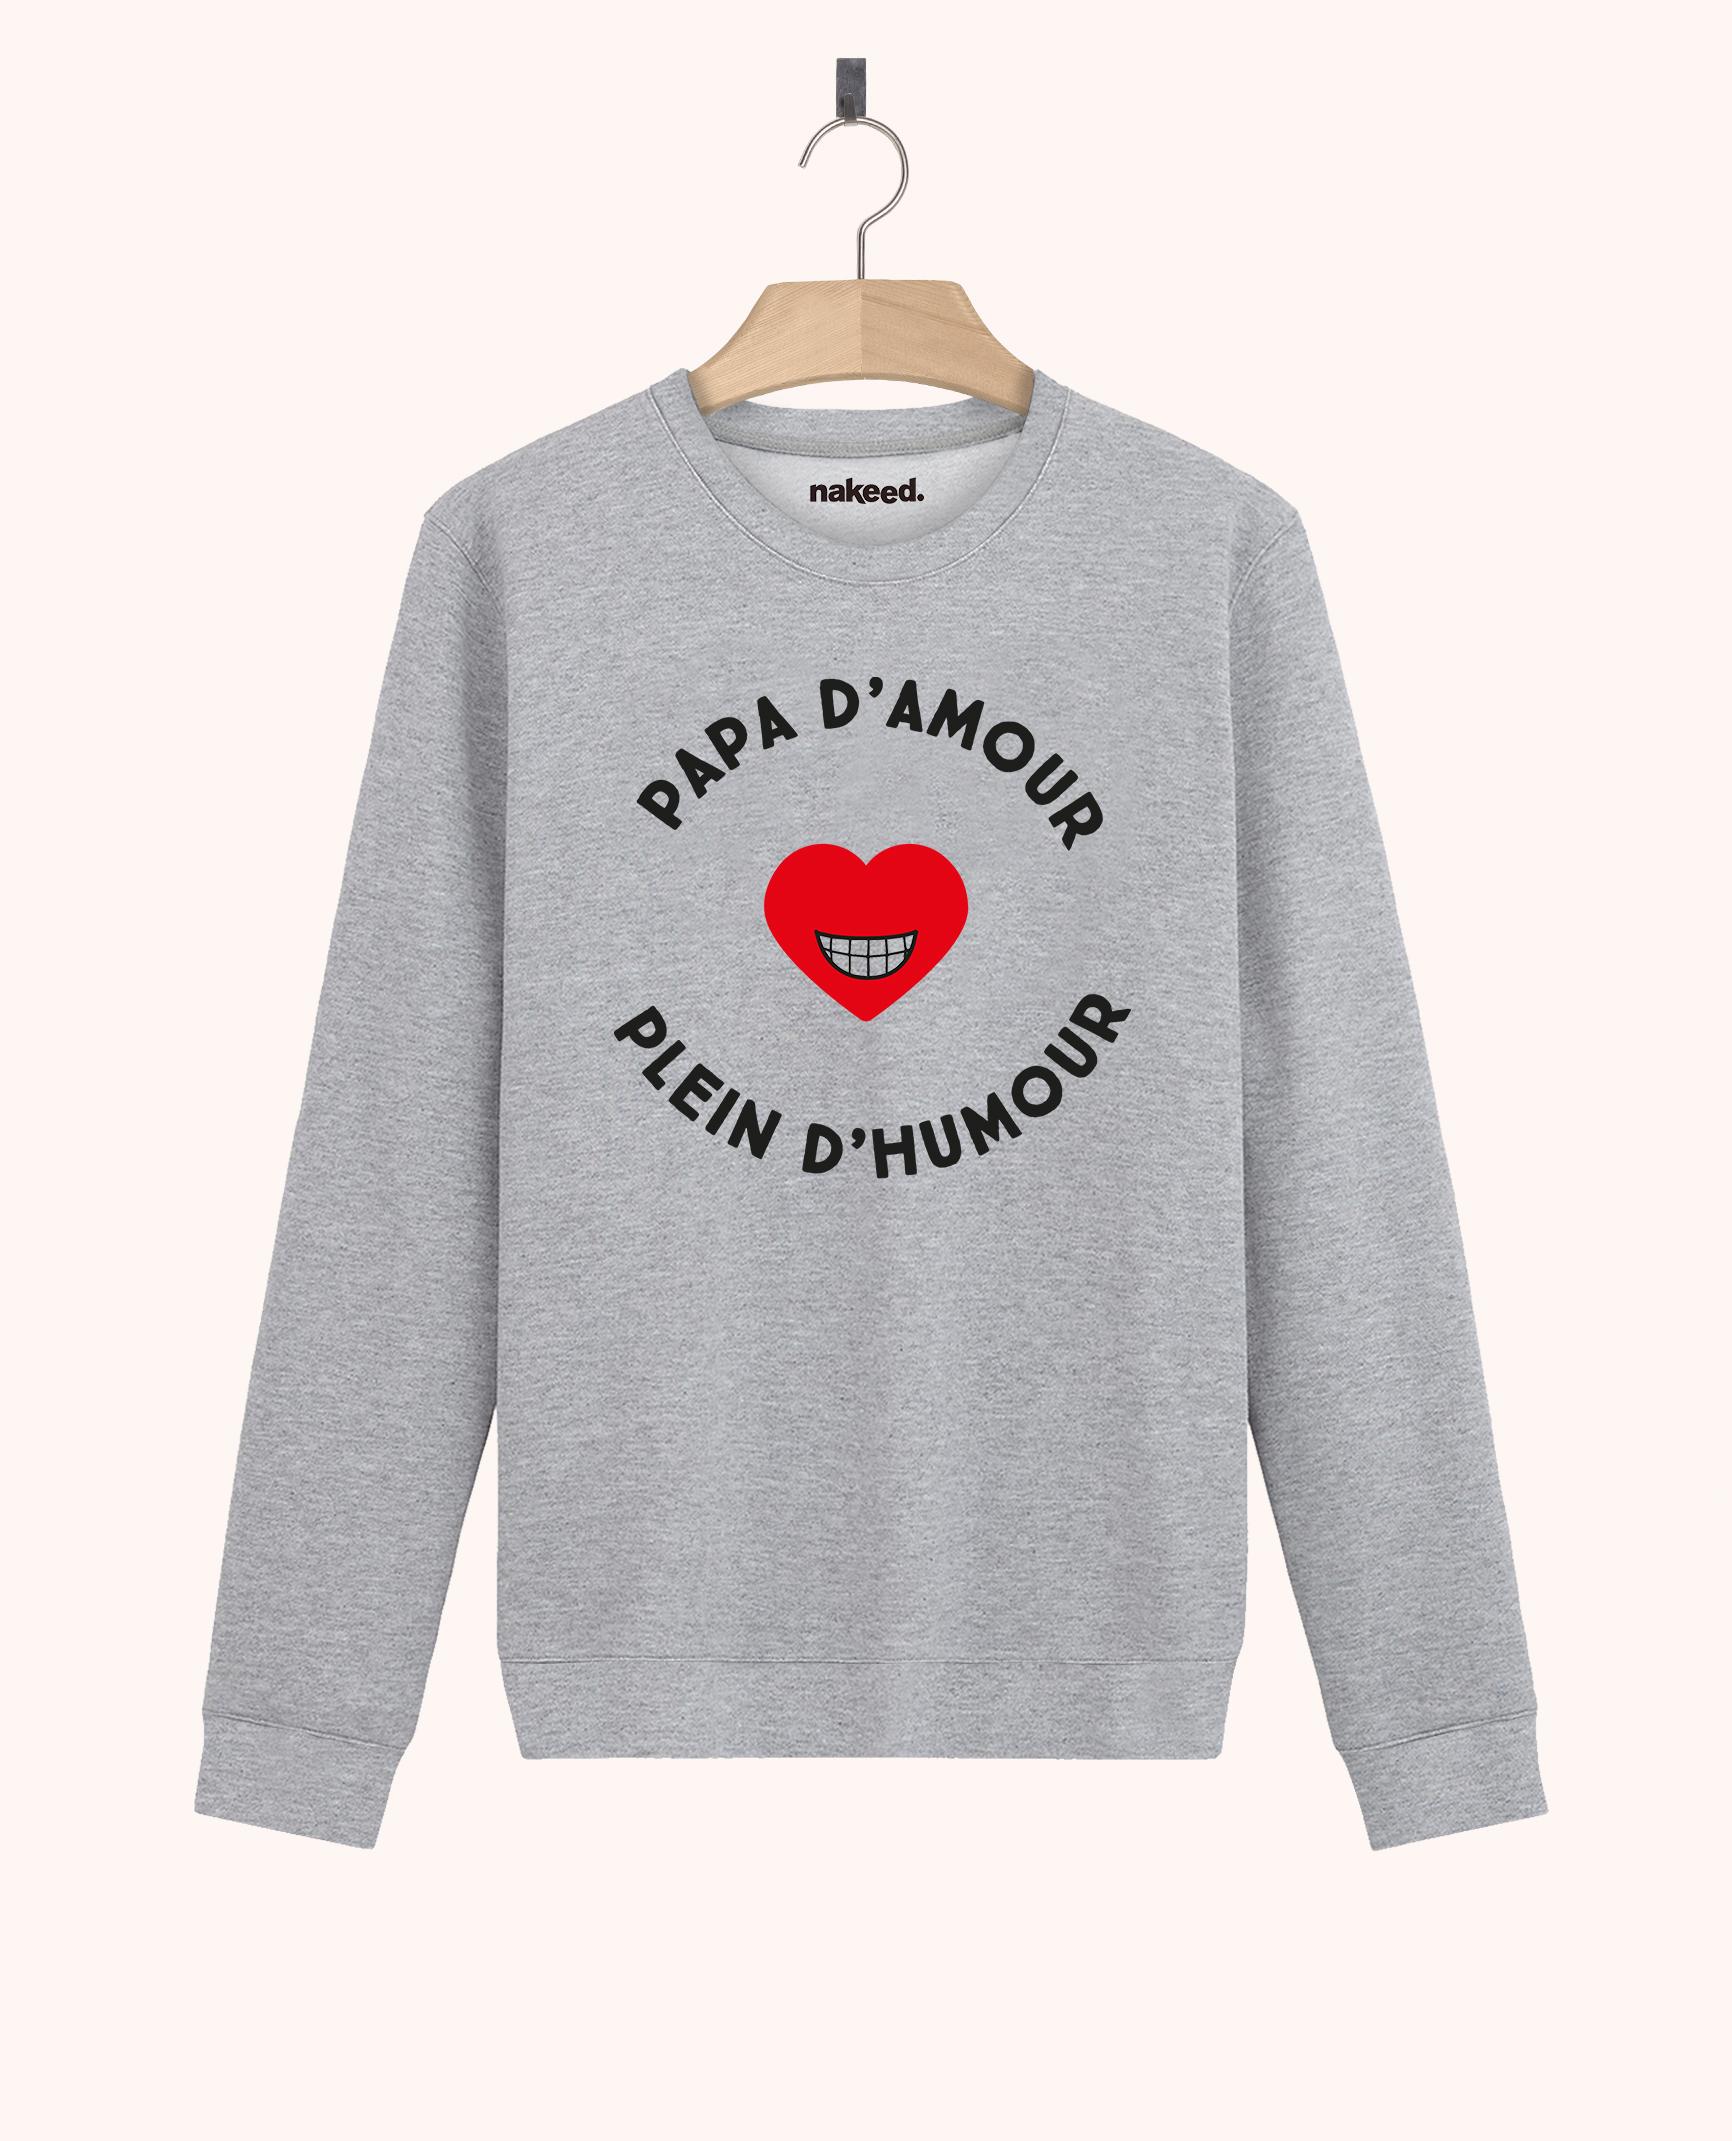 Sweatshirt Papa d'amour plein d'humour